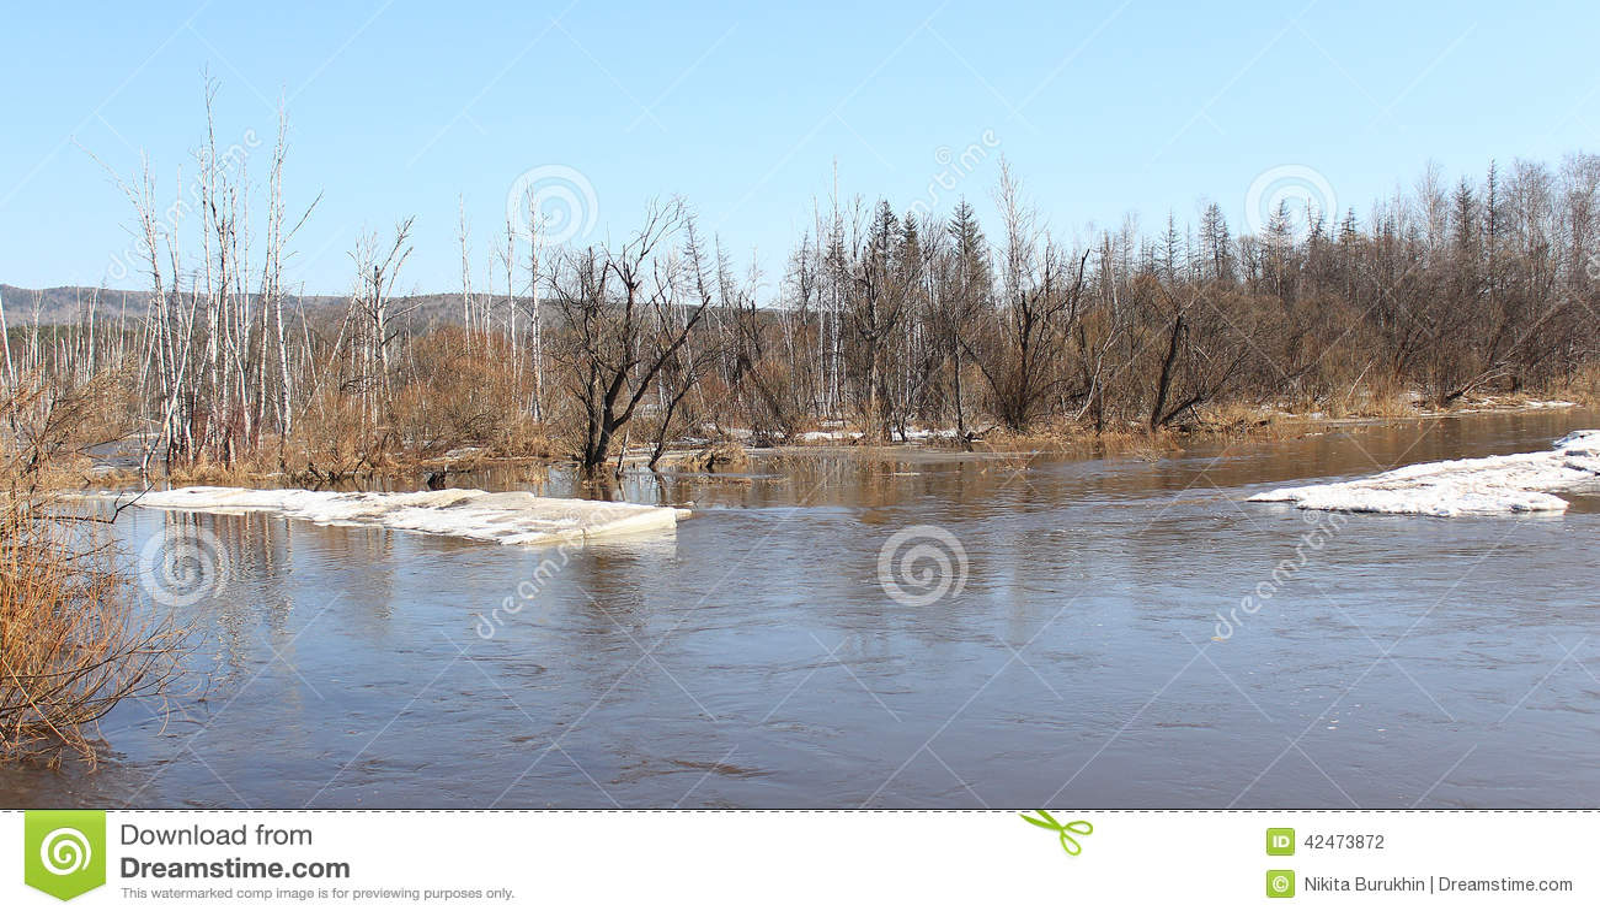 Fluss Barga nachdem dem Öffnen in Zelenogorsk